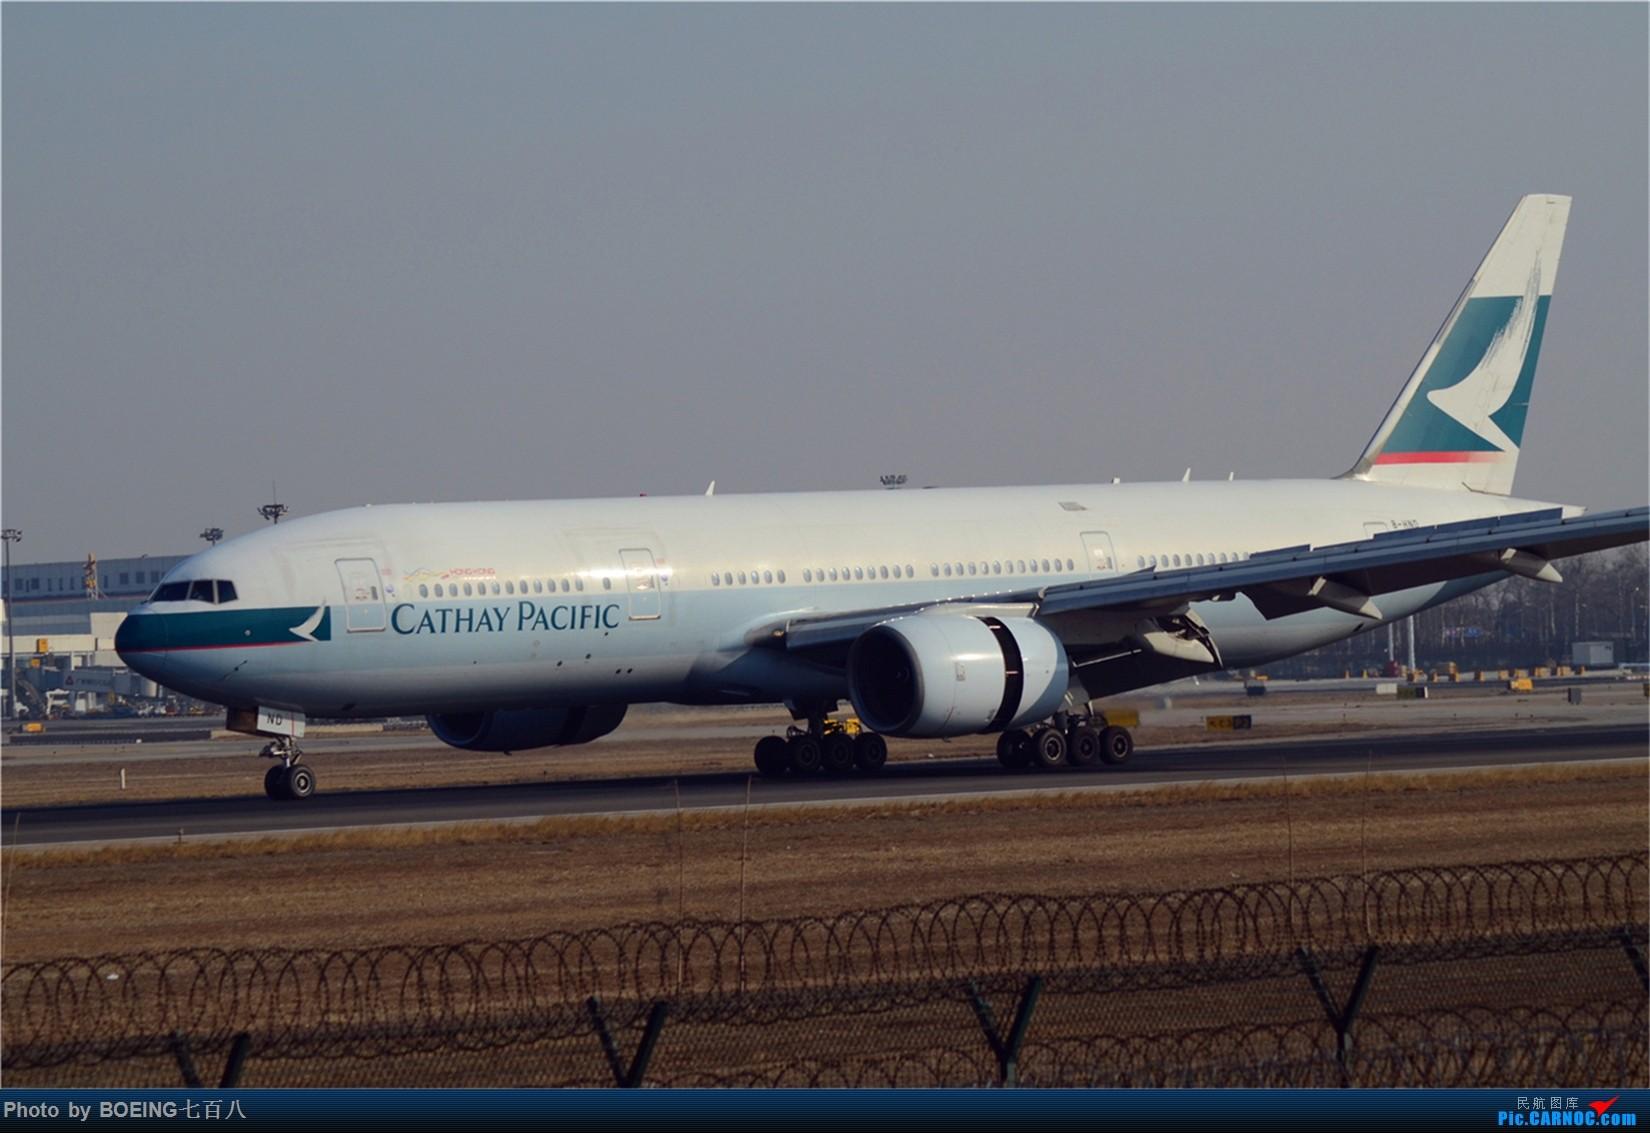 Re:[原创]大年初四收获一堆天合联盟 BOEING 777-200 B-HND 中国北京首都国际机场